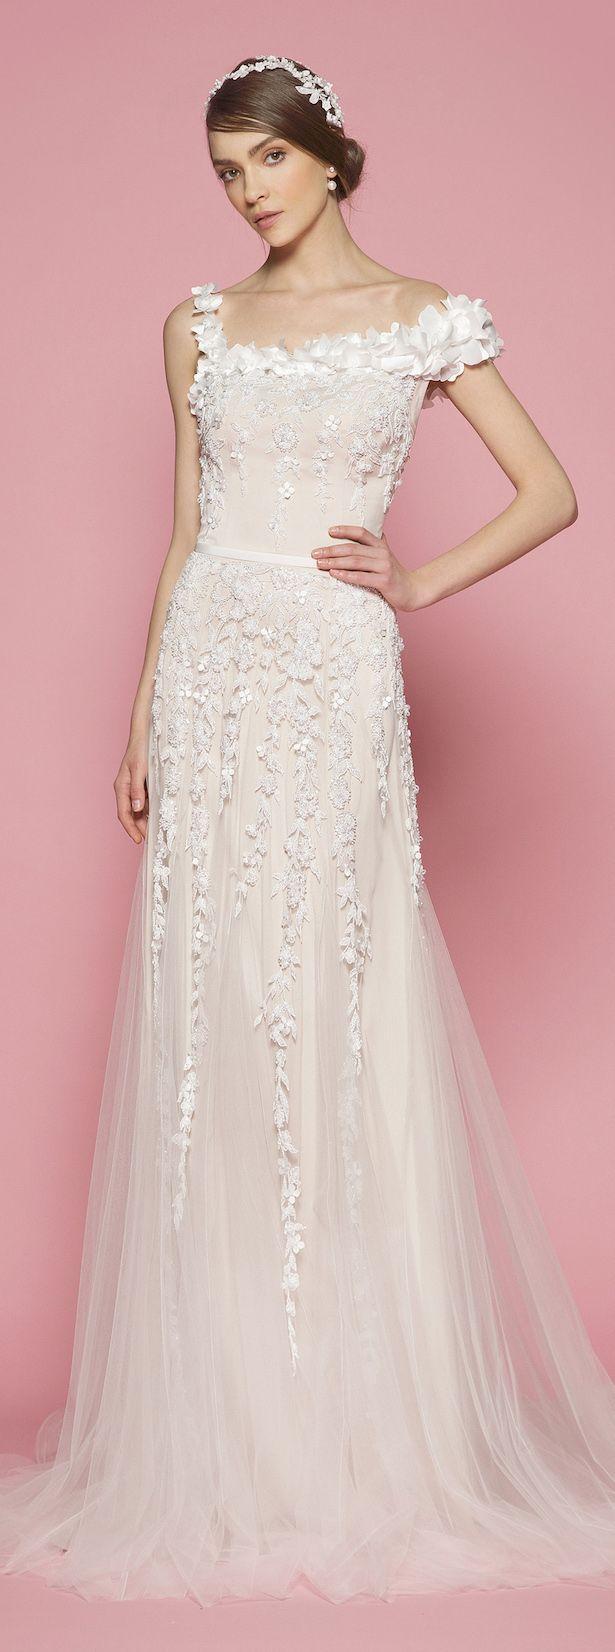 Mejores 1121 imágenes de Wedding dresses en Pinterest   Vestidos de ...